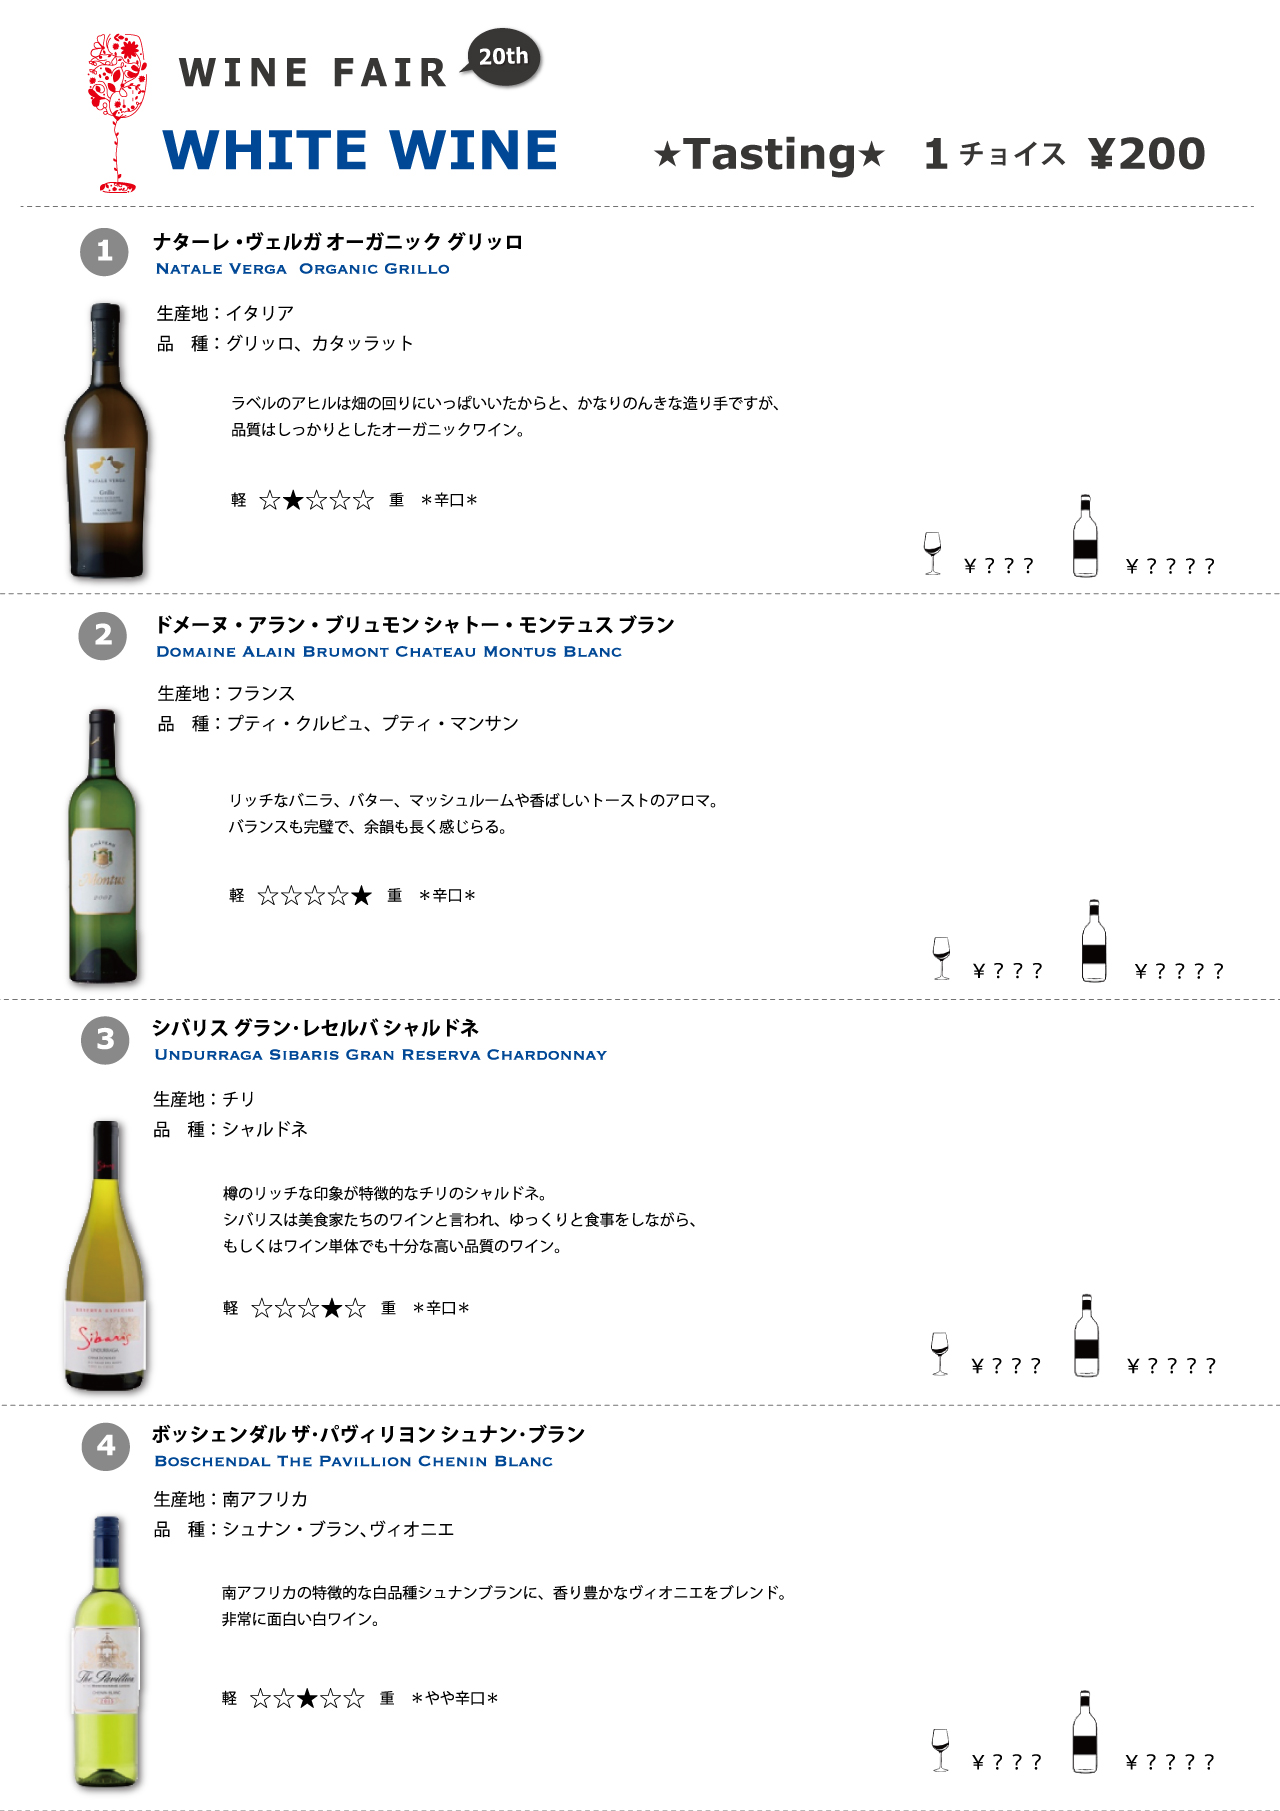 flax_2017_WineFair_白ワインリスト